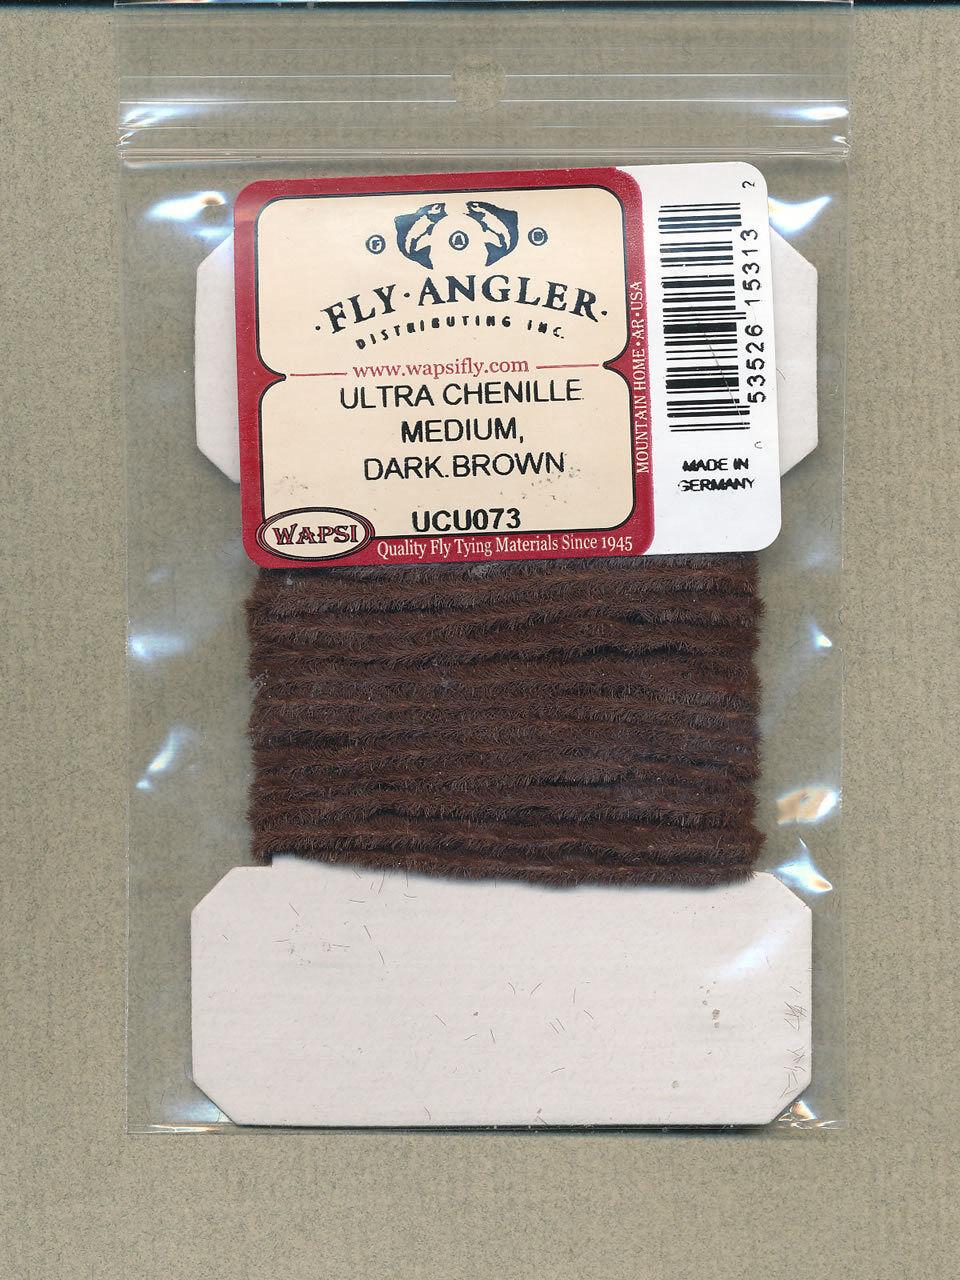 Ultra chenille medium dark brown     UCU073